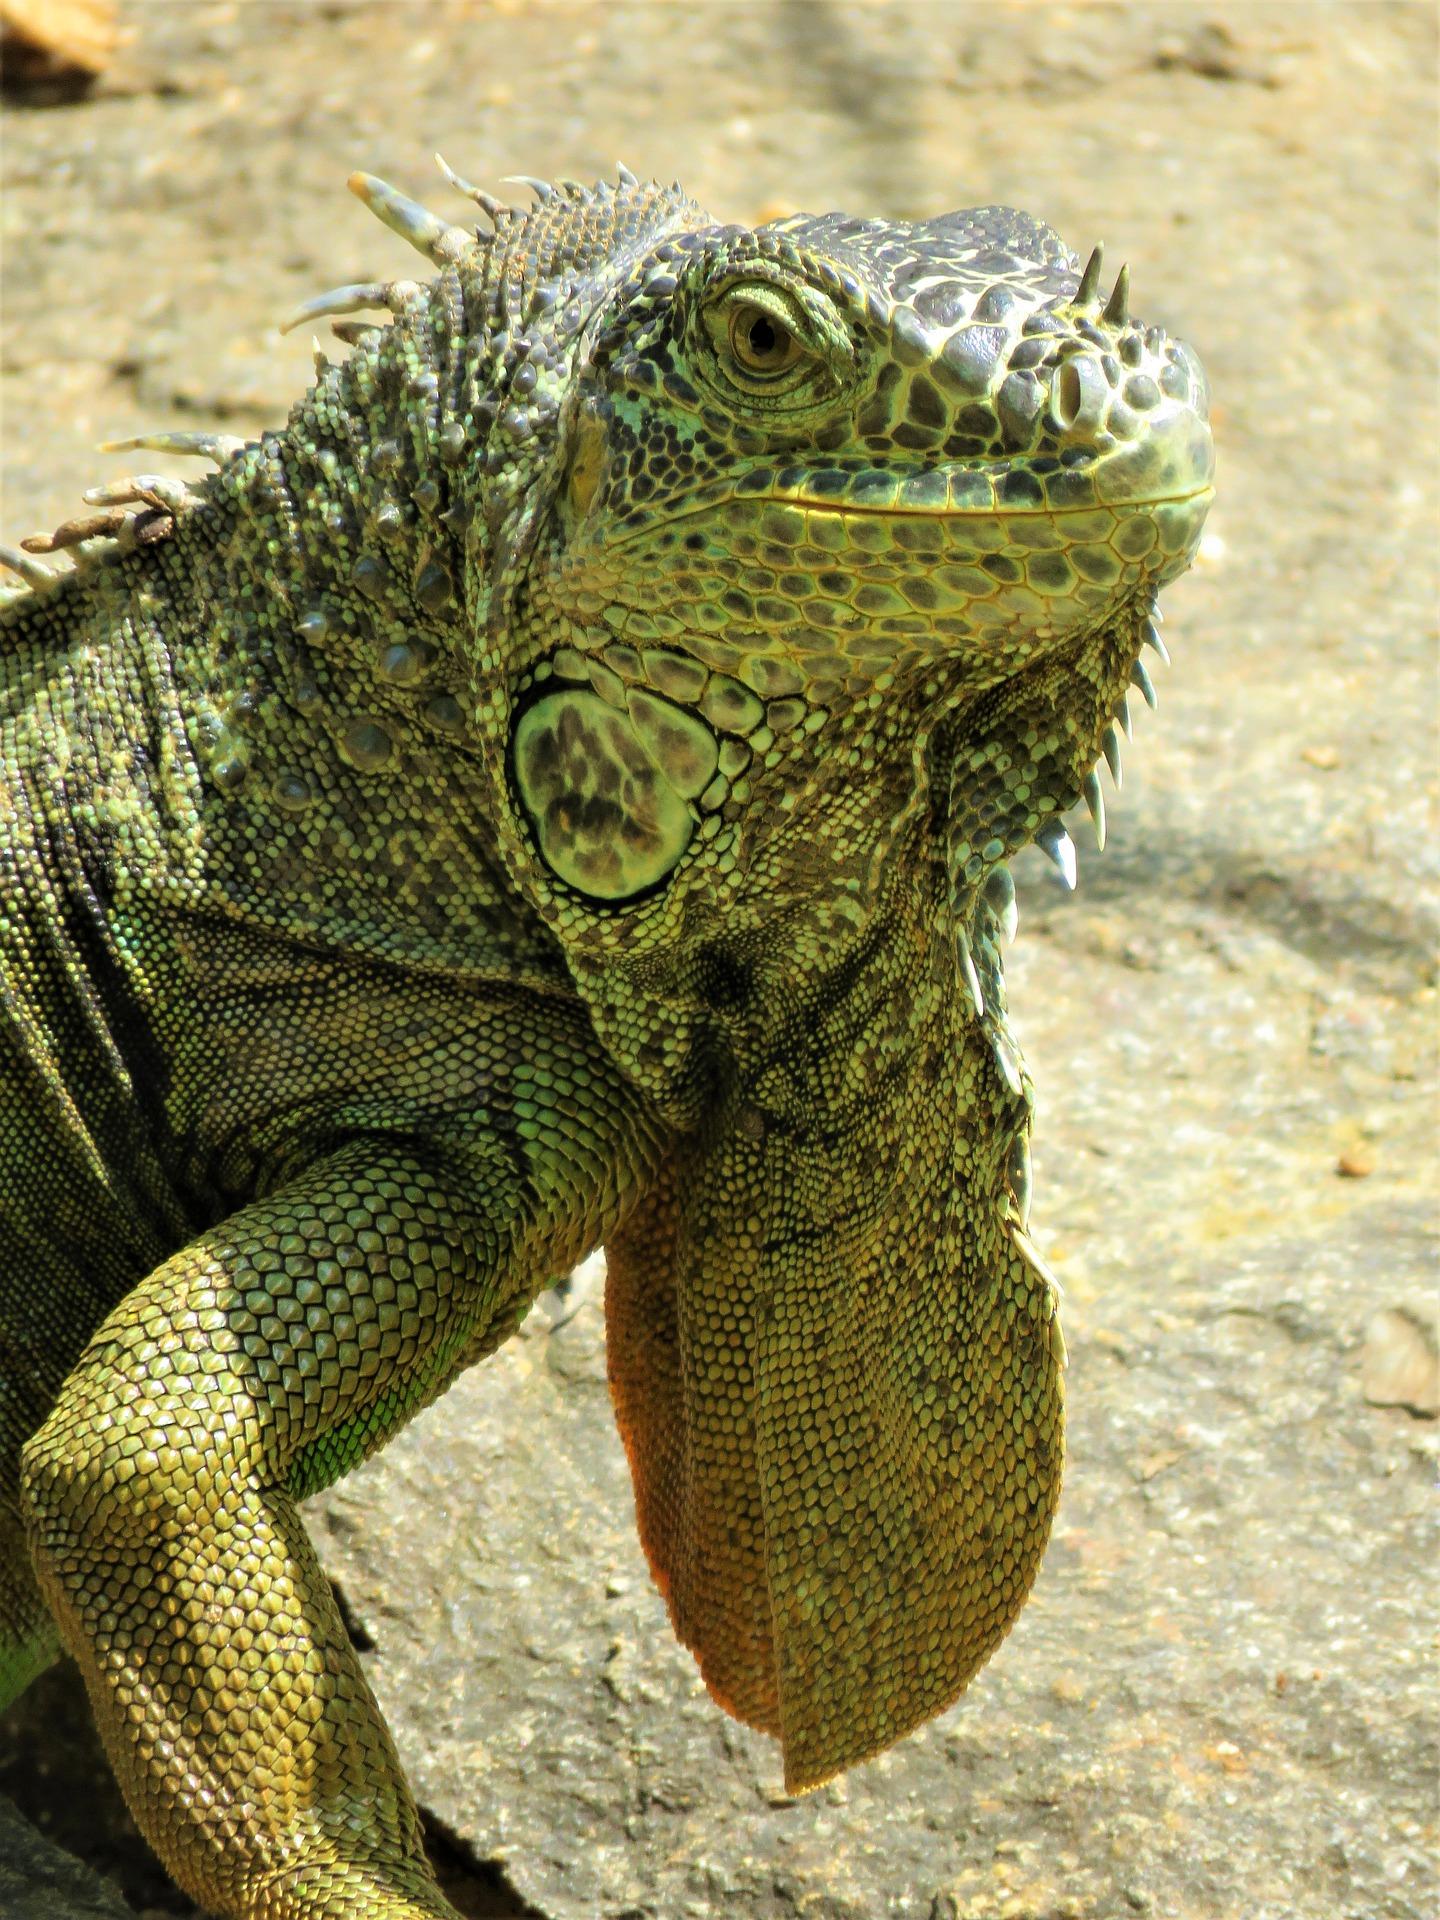 close up of iguana face, feet on road